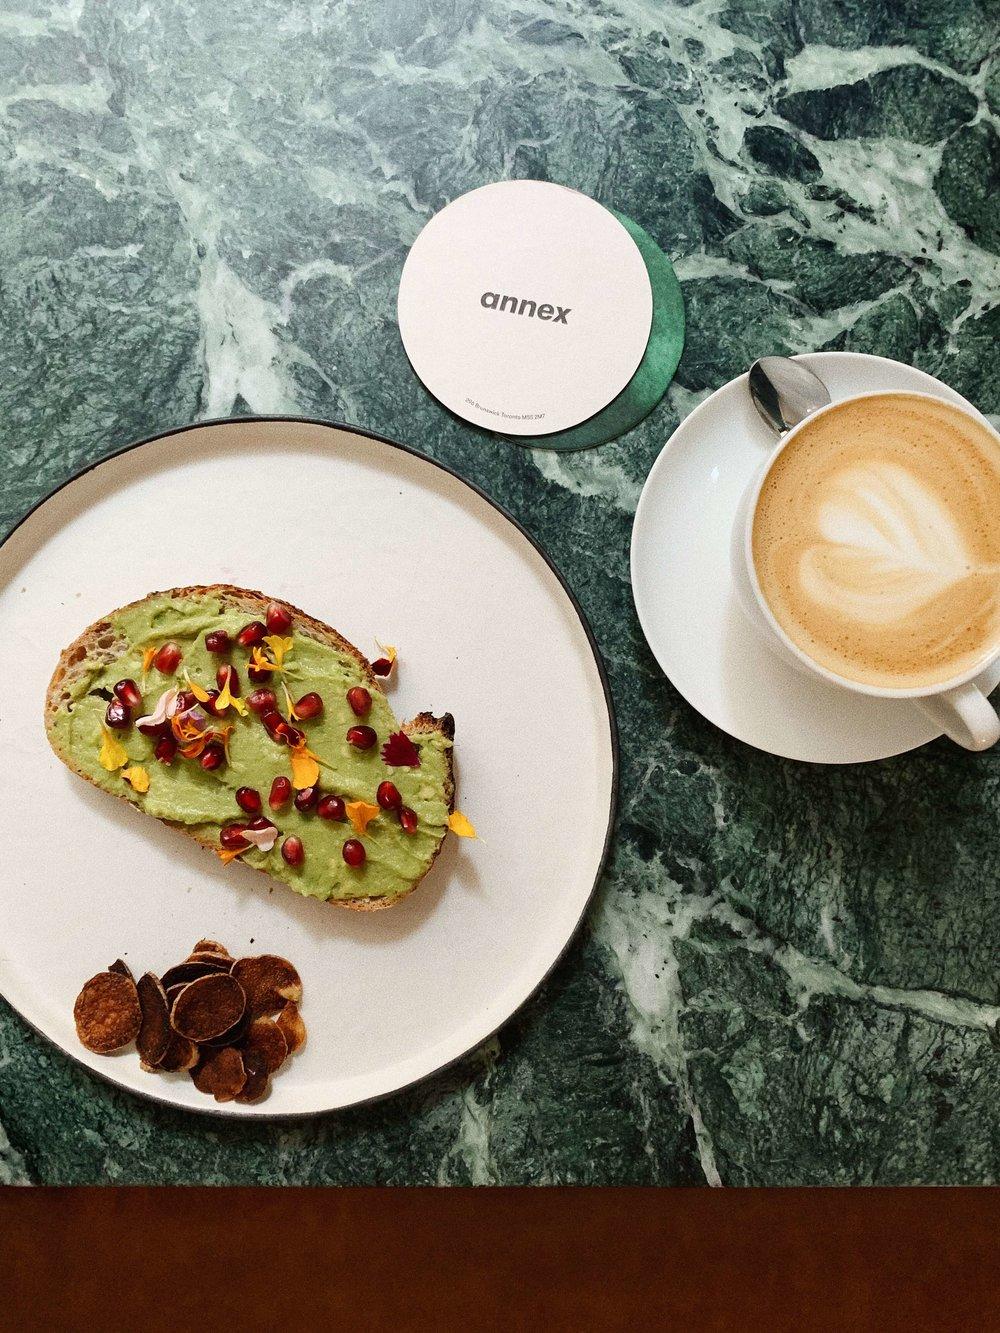 taraleighrose-annexhotel-toronto-influencer-lifestyle-influencer-food (1).JPG